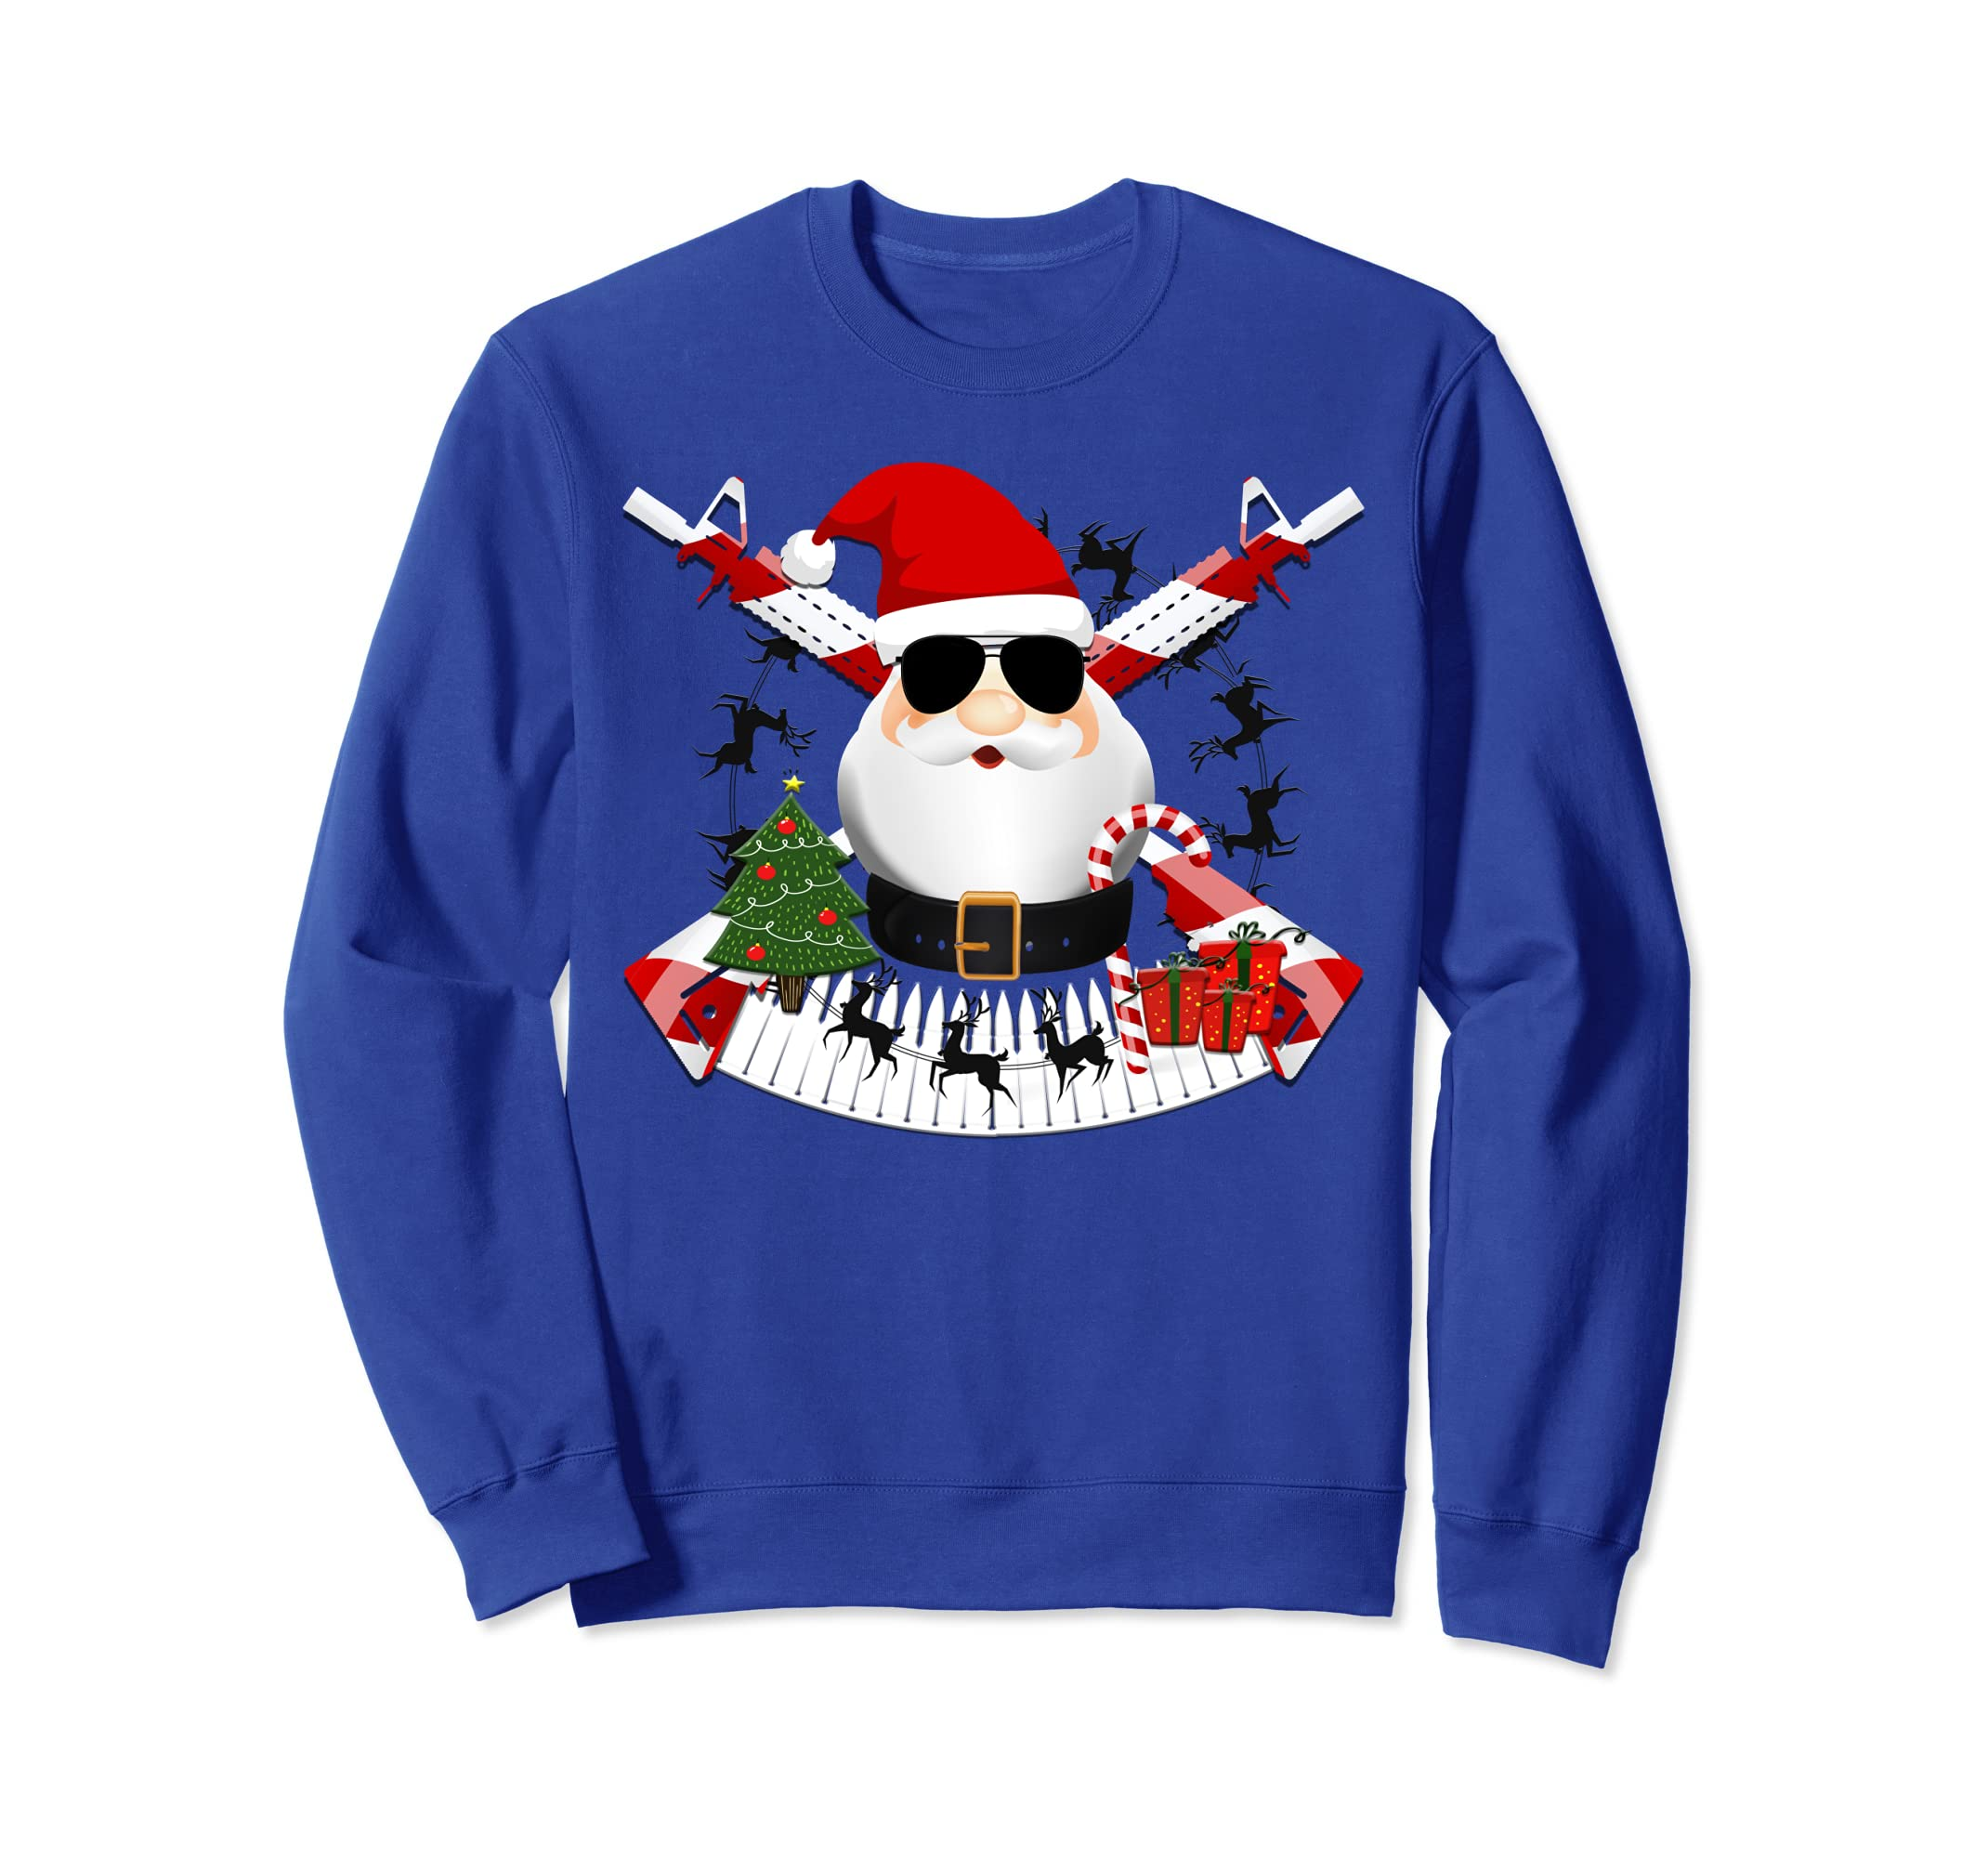 cabe7034 Amazon.com: Funny AR-15 Santa Military Christmas Sweatshirt: Clothing